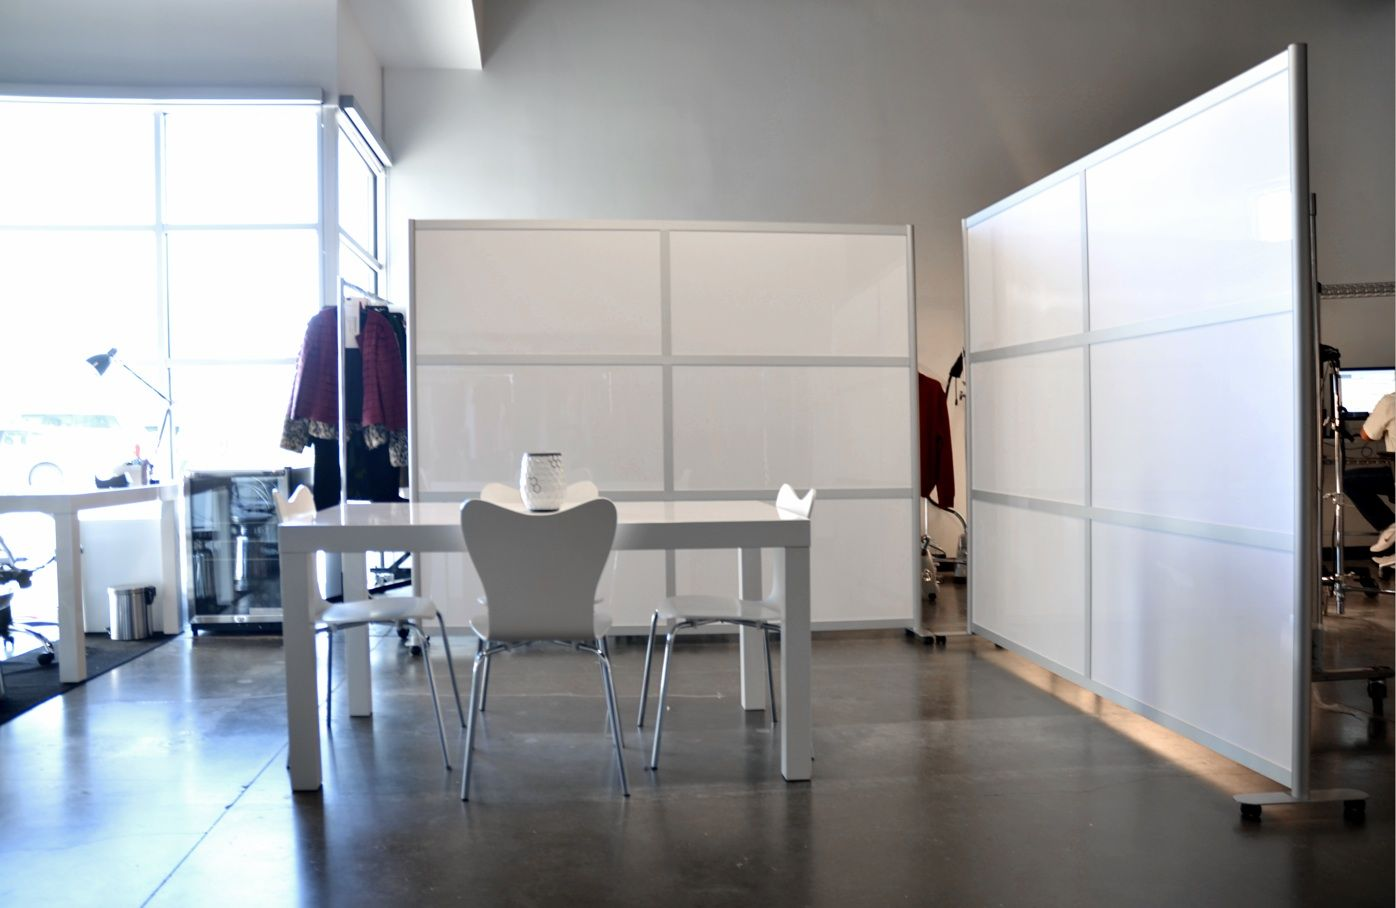 loftwall walls dividers. Black Bedroom Furniture Sets. Home Design Ideas